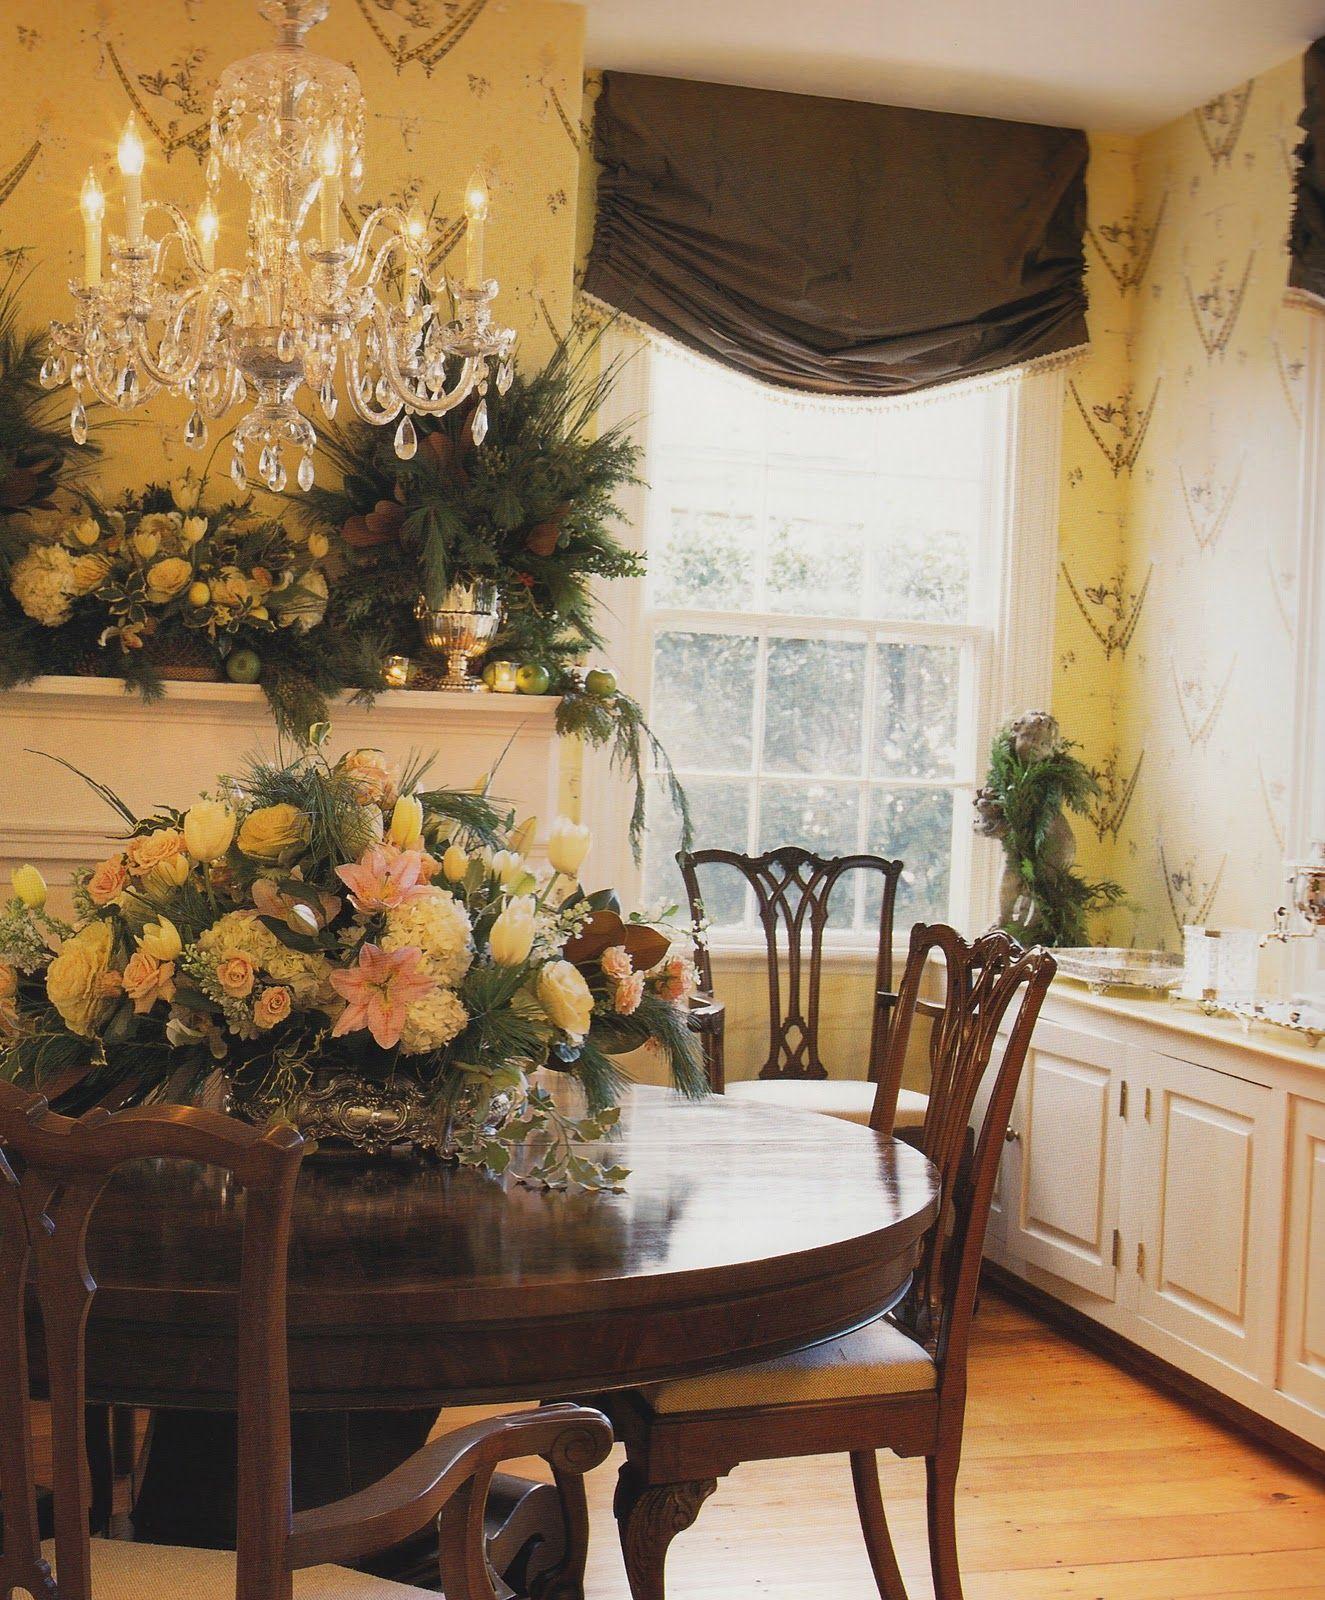 The 25 Best Box Room Ideas Ideas On Pinterest: Best 25+ Dining Room Windows Ideas On Pinterest